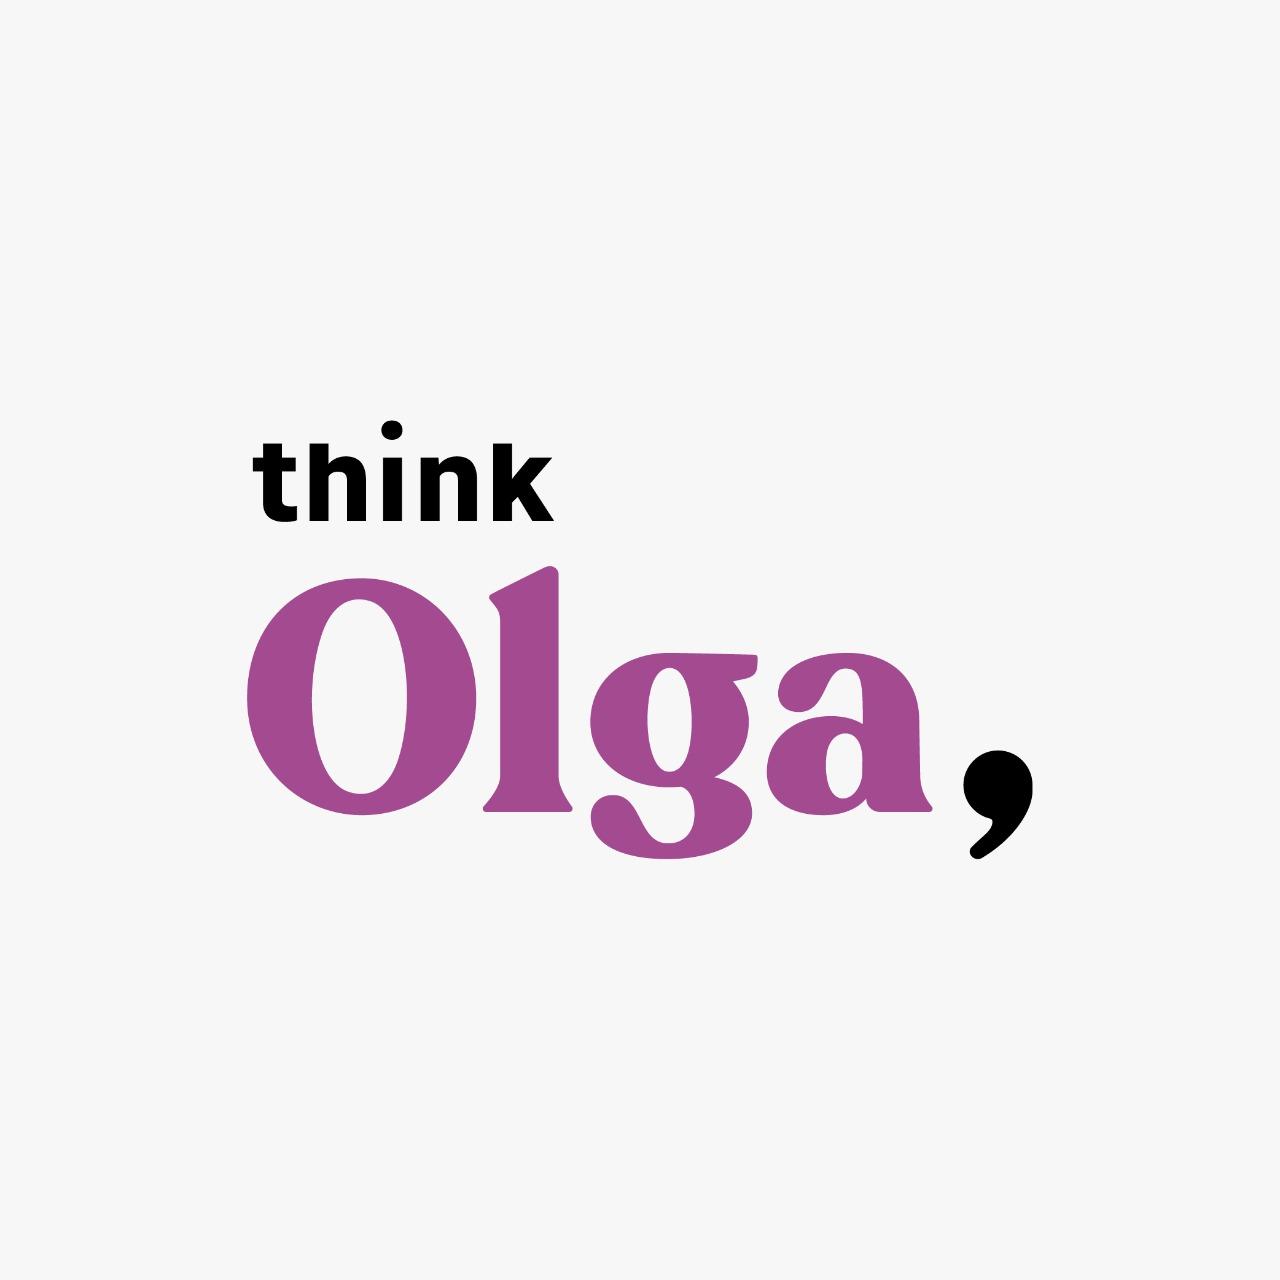 Think Olga